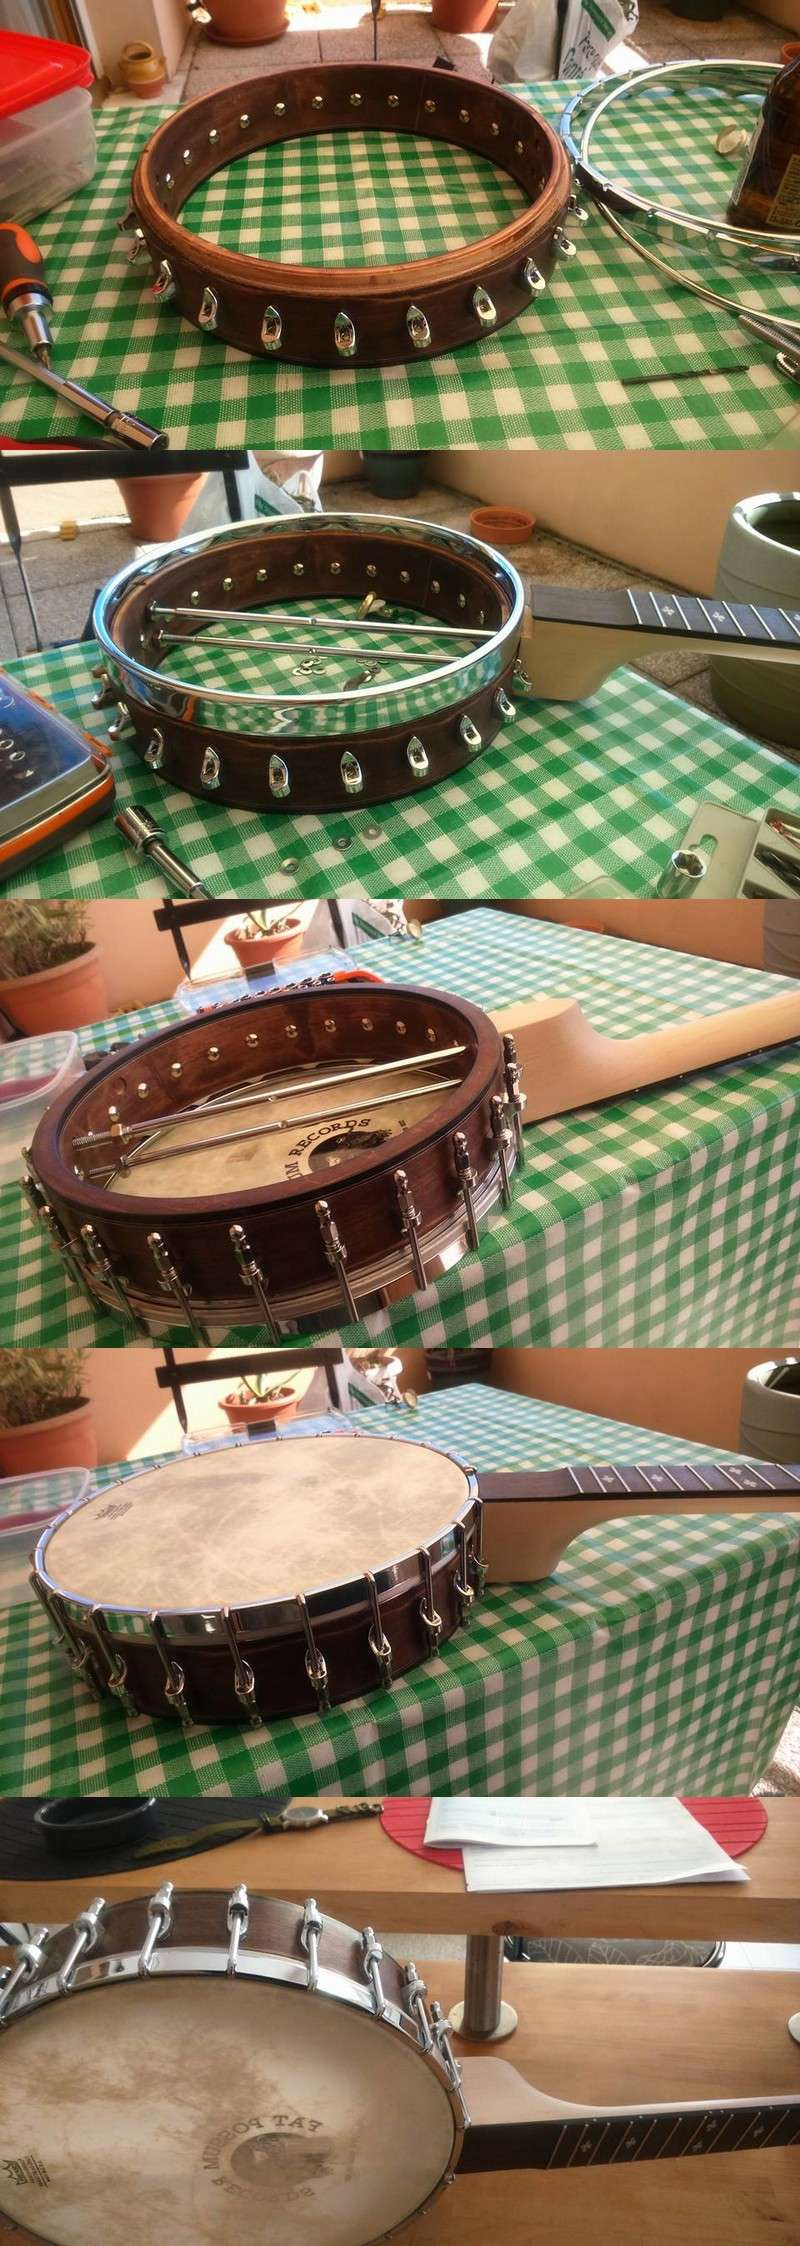 banjo 000010